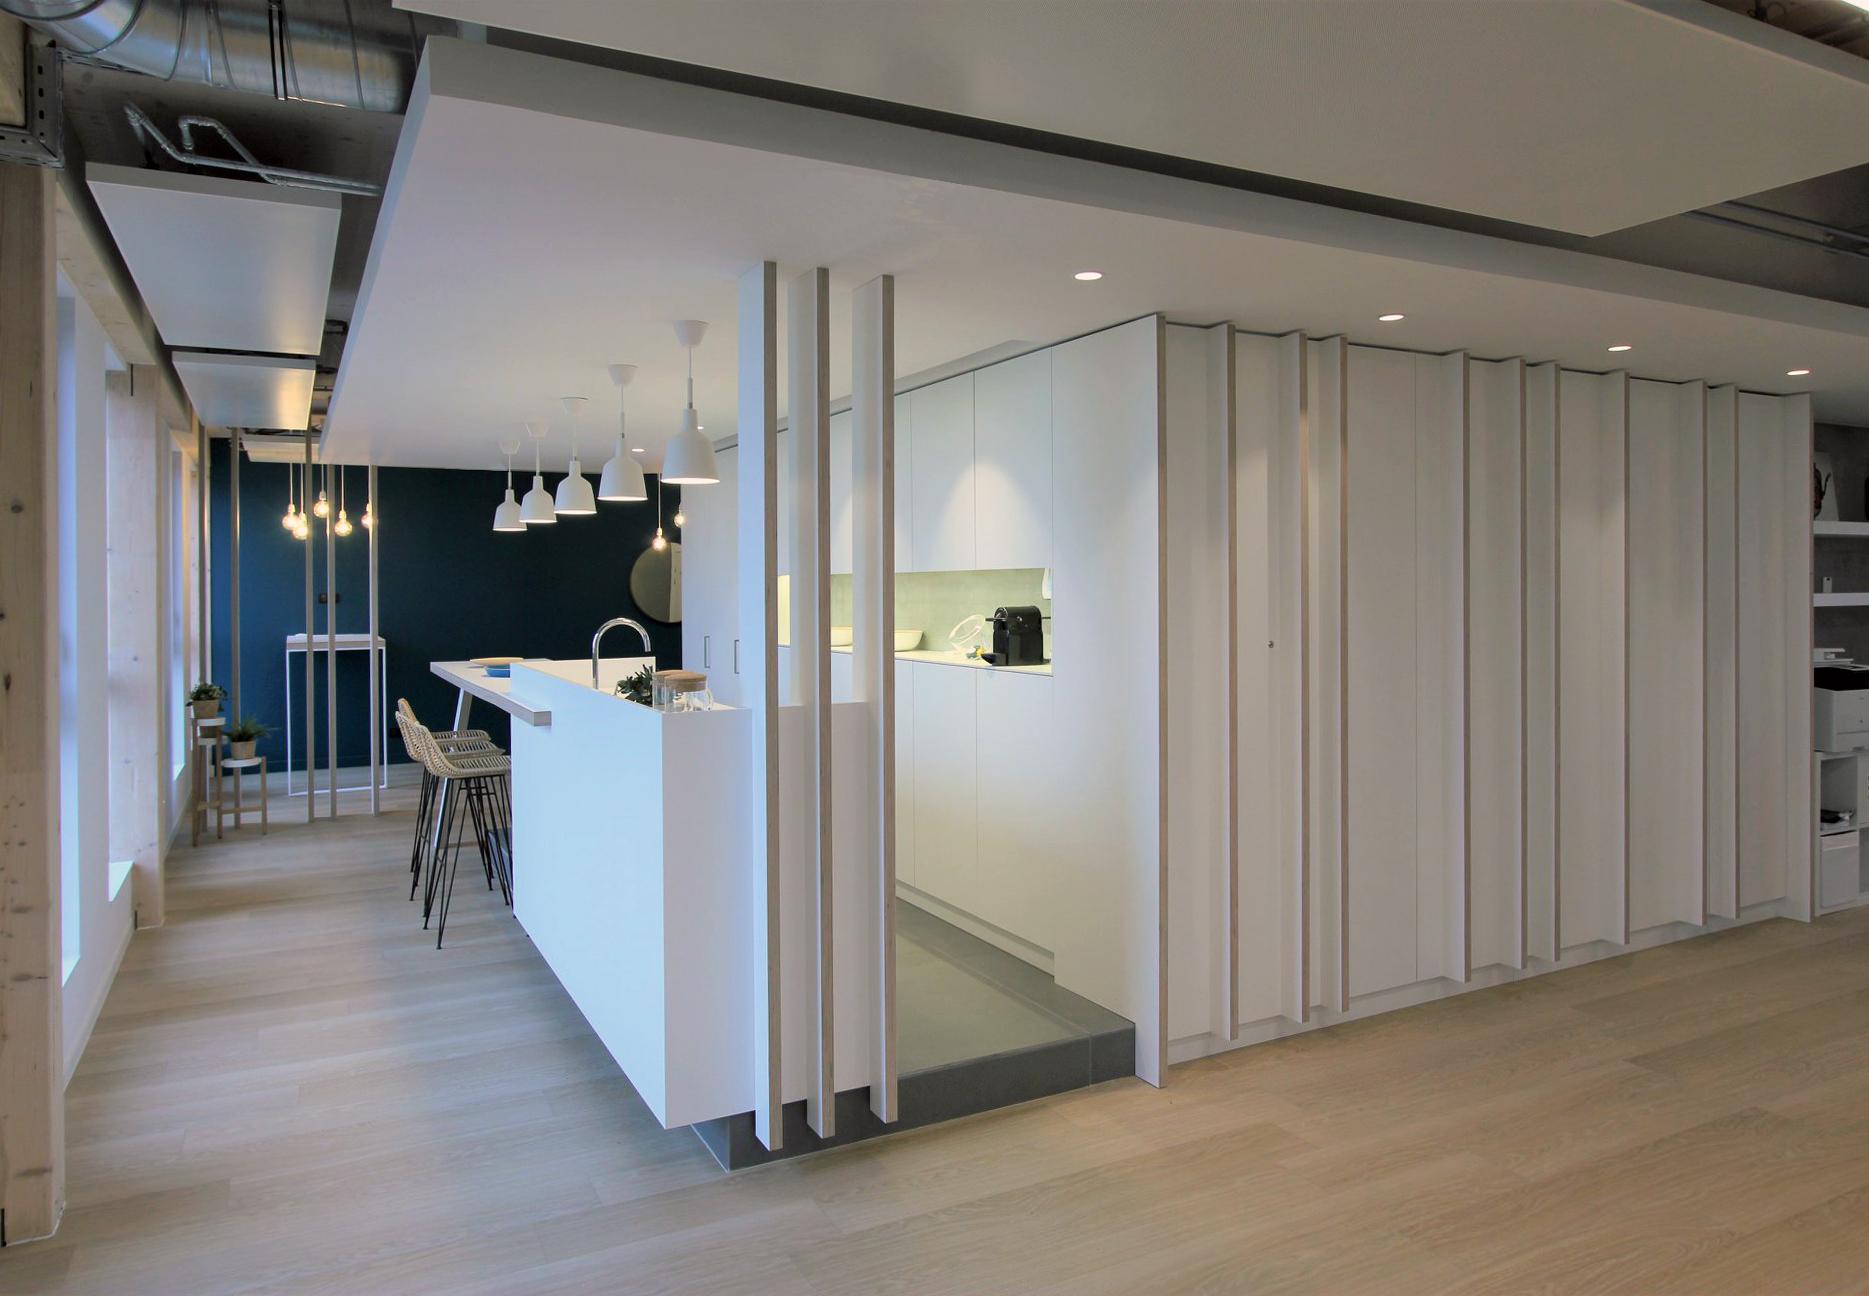 bureaux cap ver woodtime bondues guillaume da silva. Black Bedroom Furniture Sets. Home Design Ideas